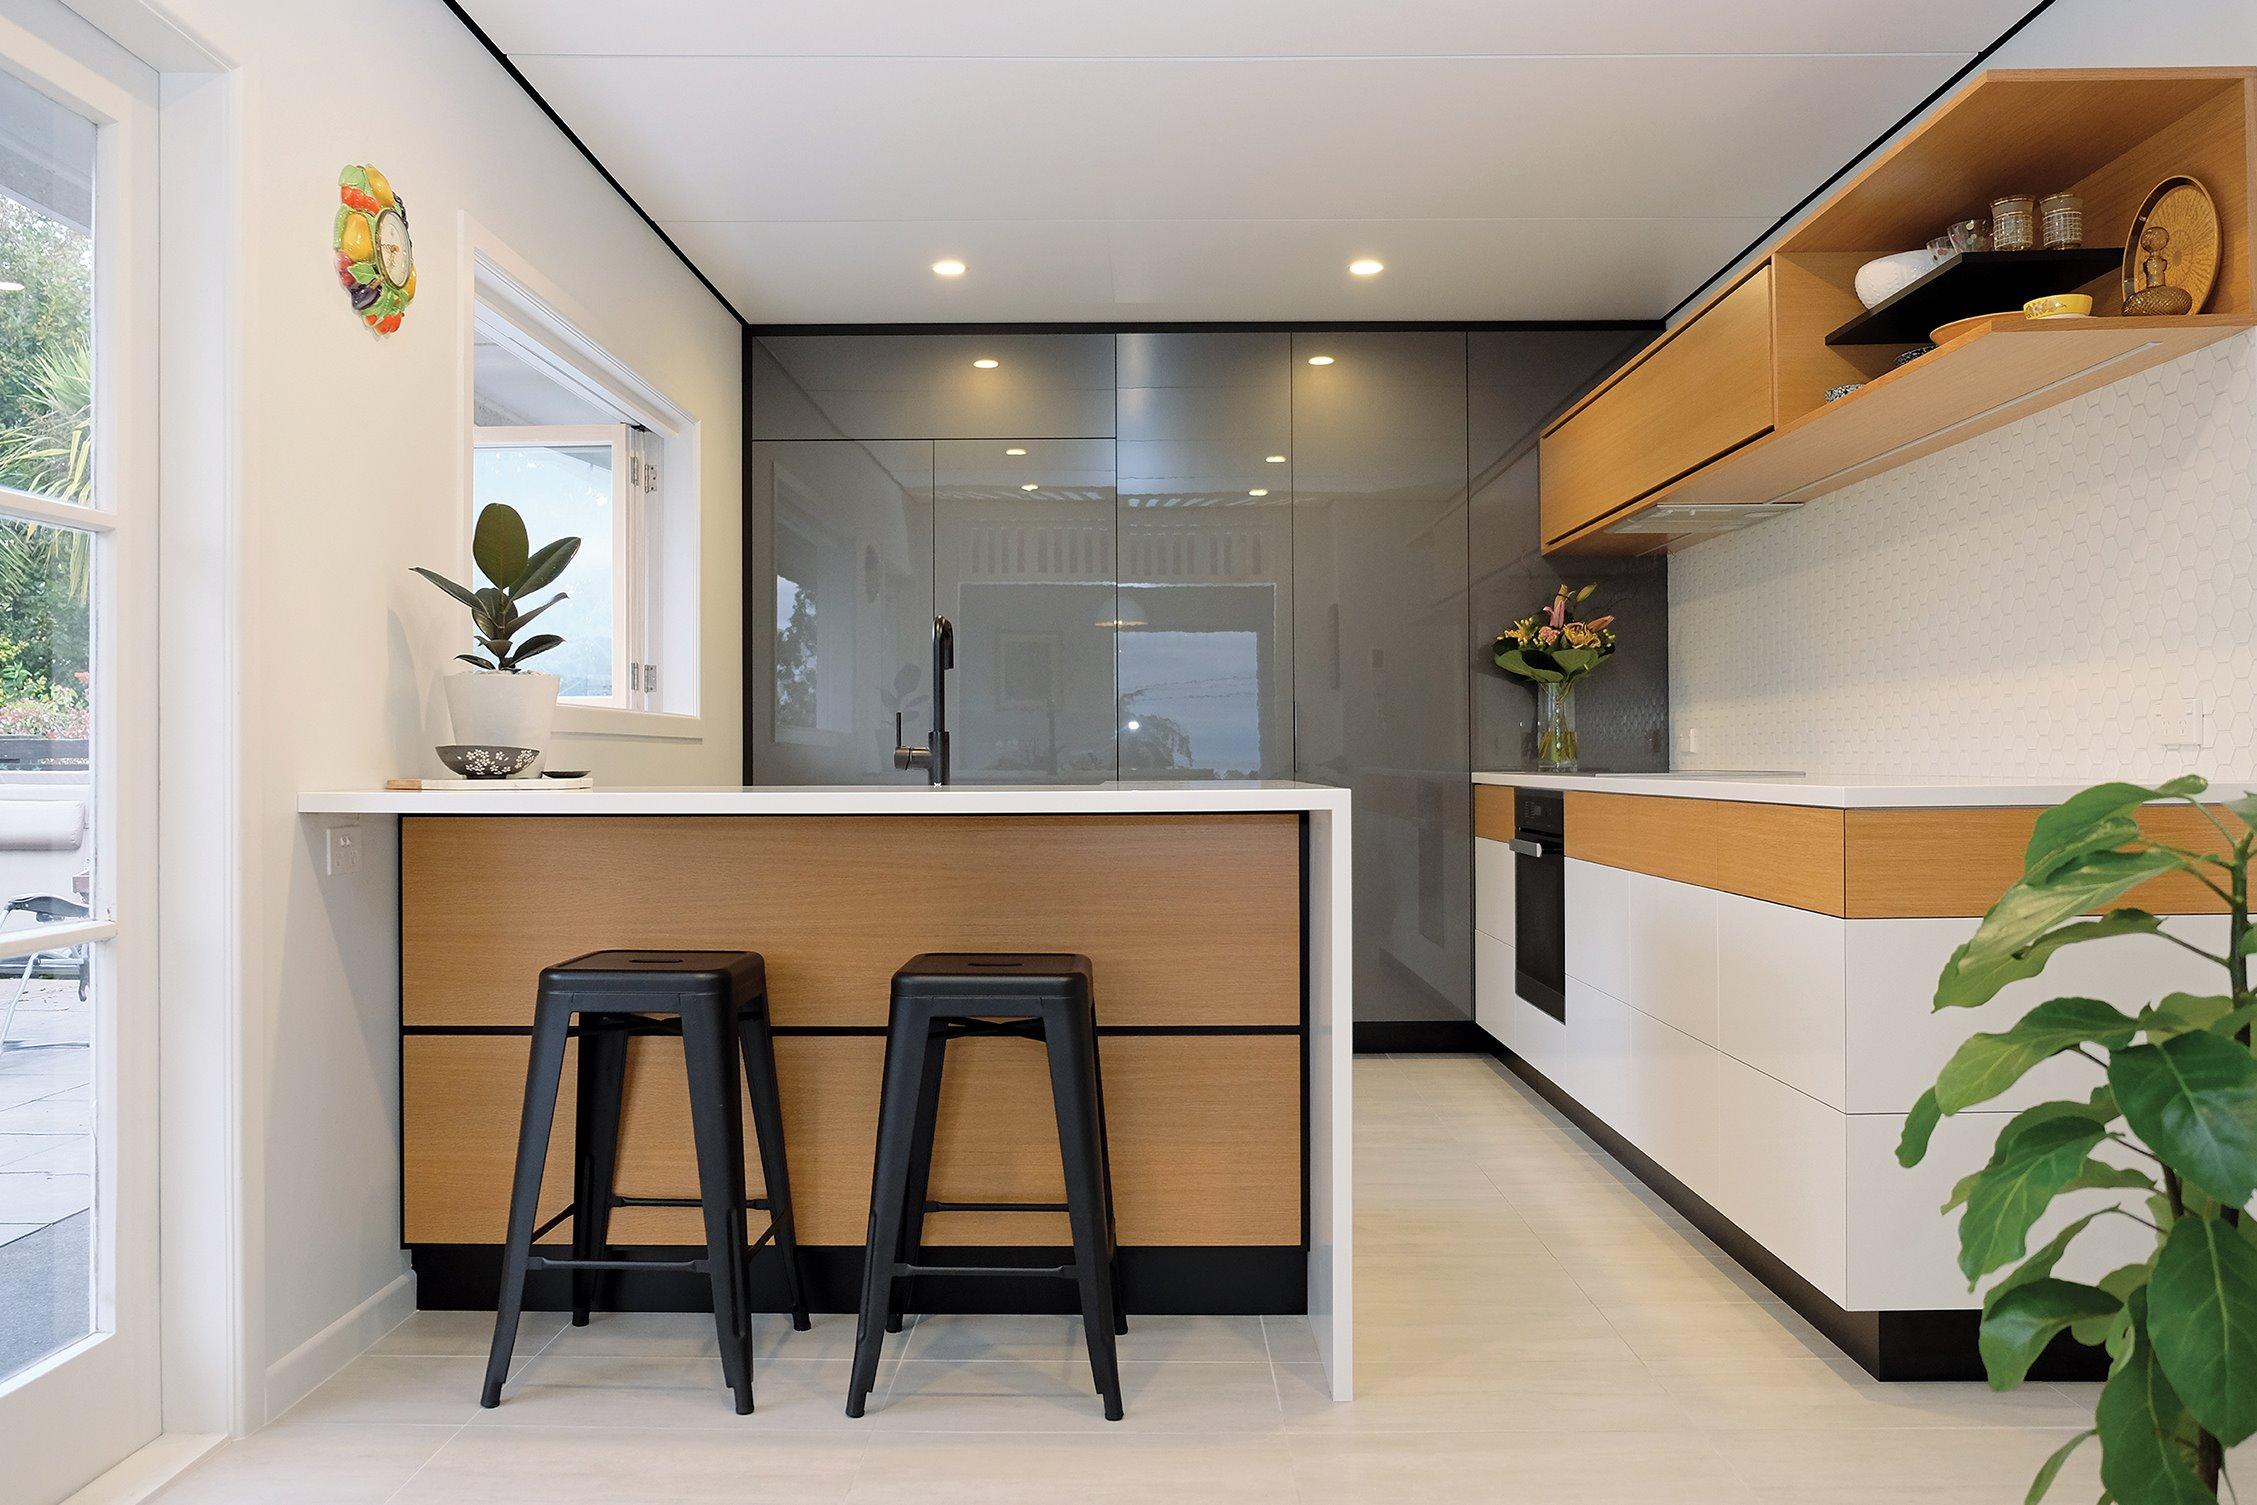 Previous; Next Kitchen Design New Plymouth H